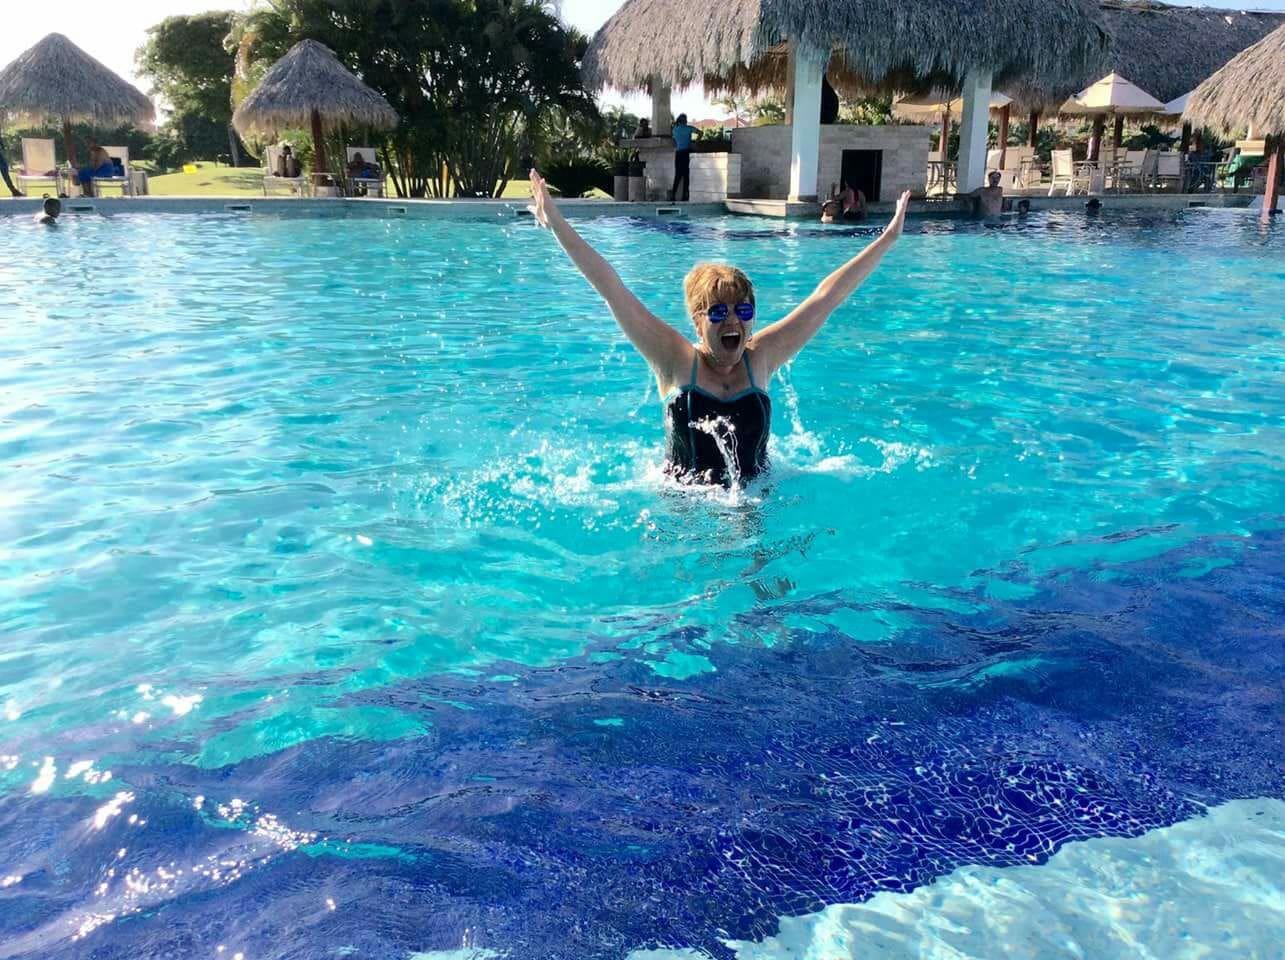 Enjoying the casa club pool.